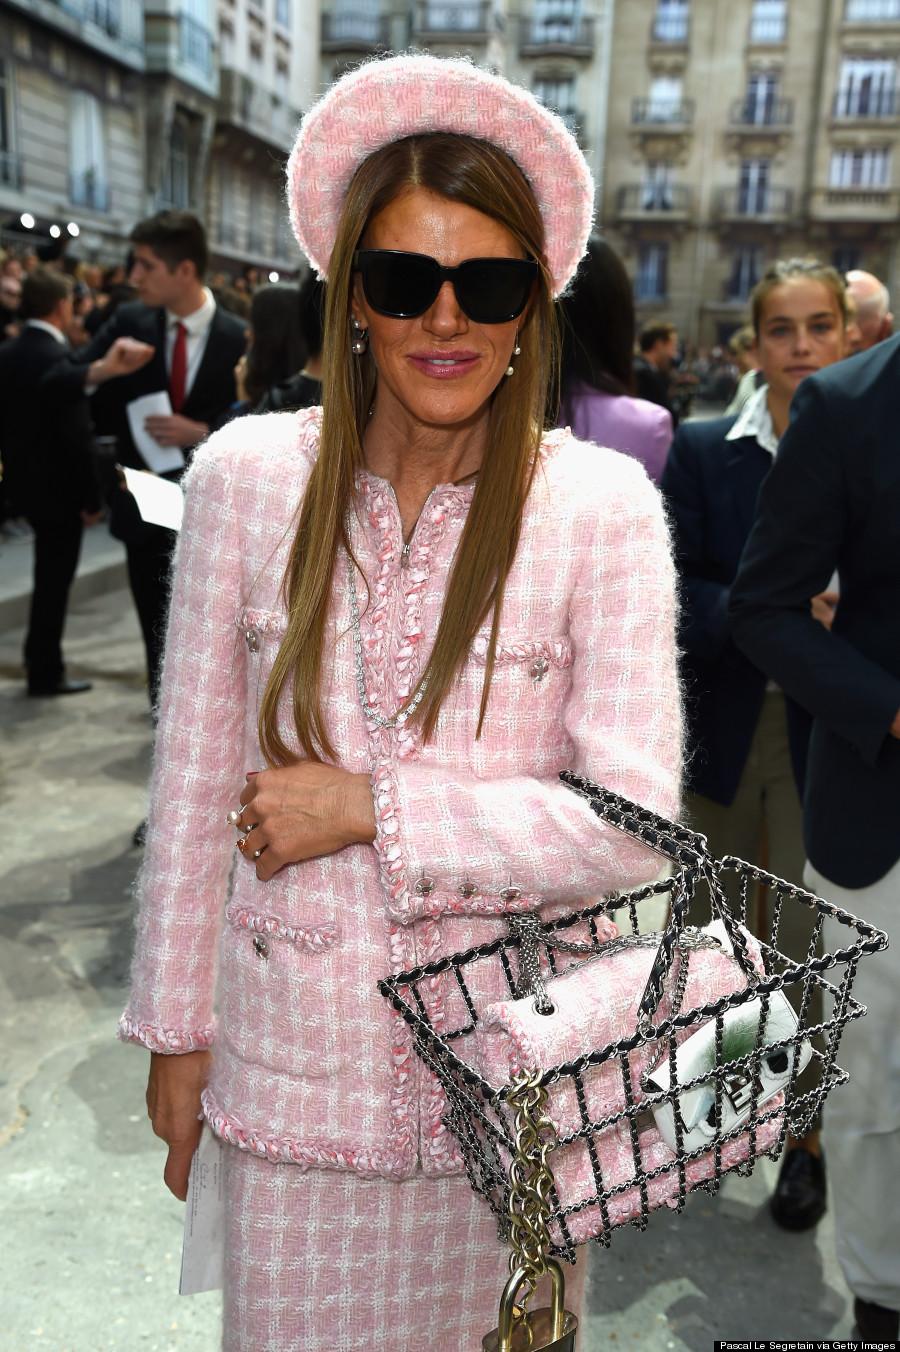 Anna_Dello_Russo_Chanel_Shopping_Basket.jpg